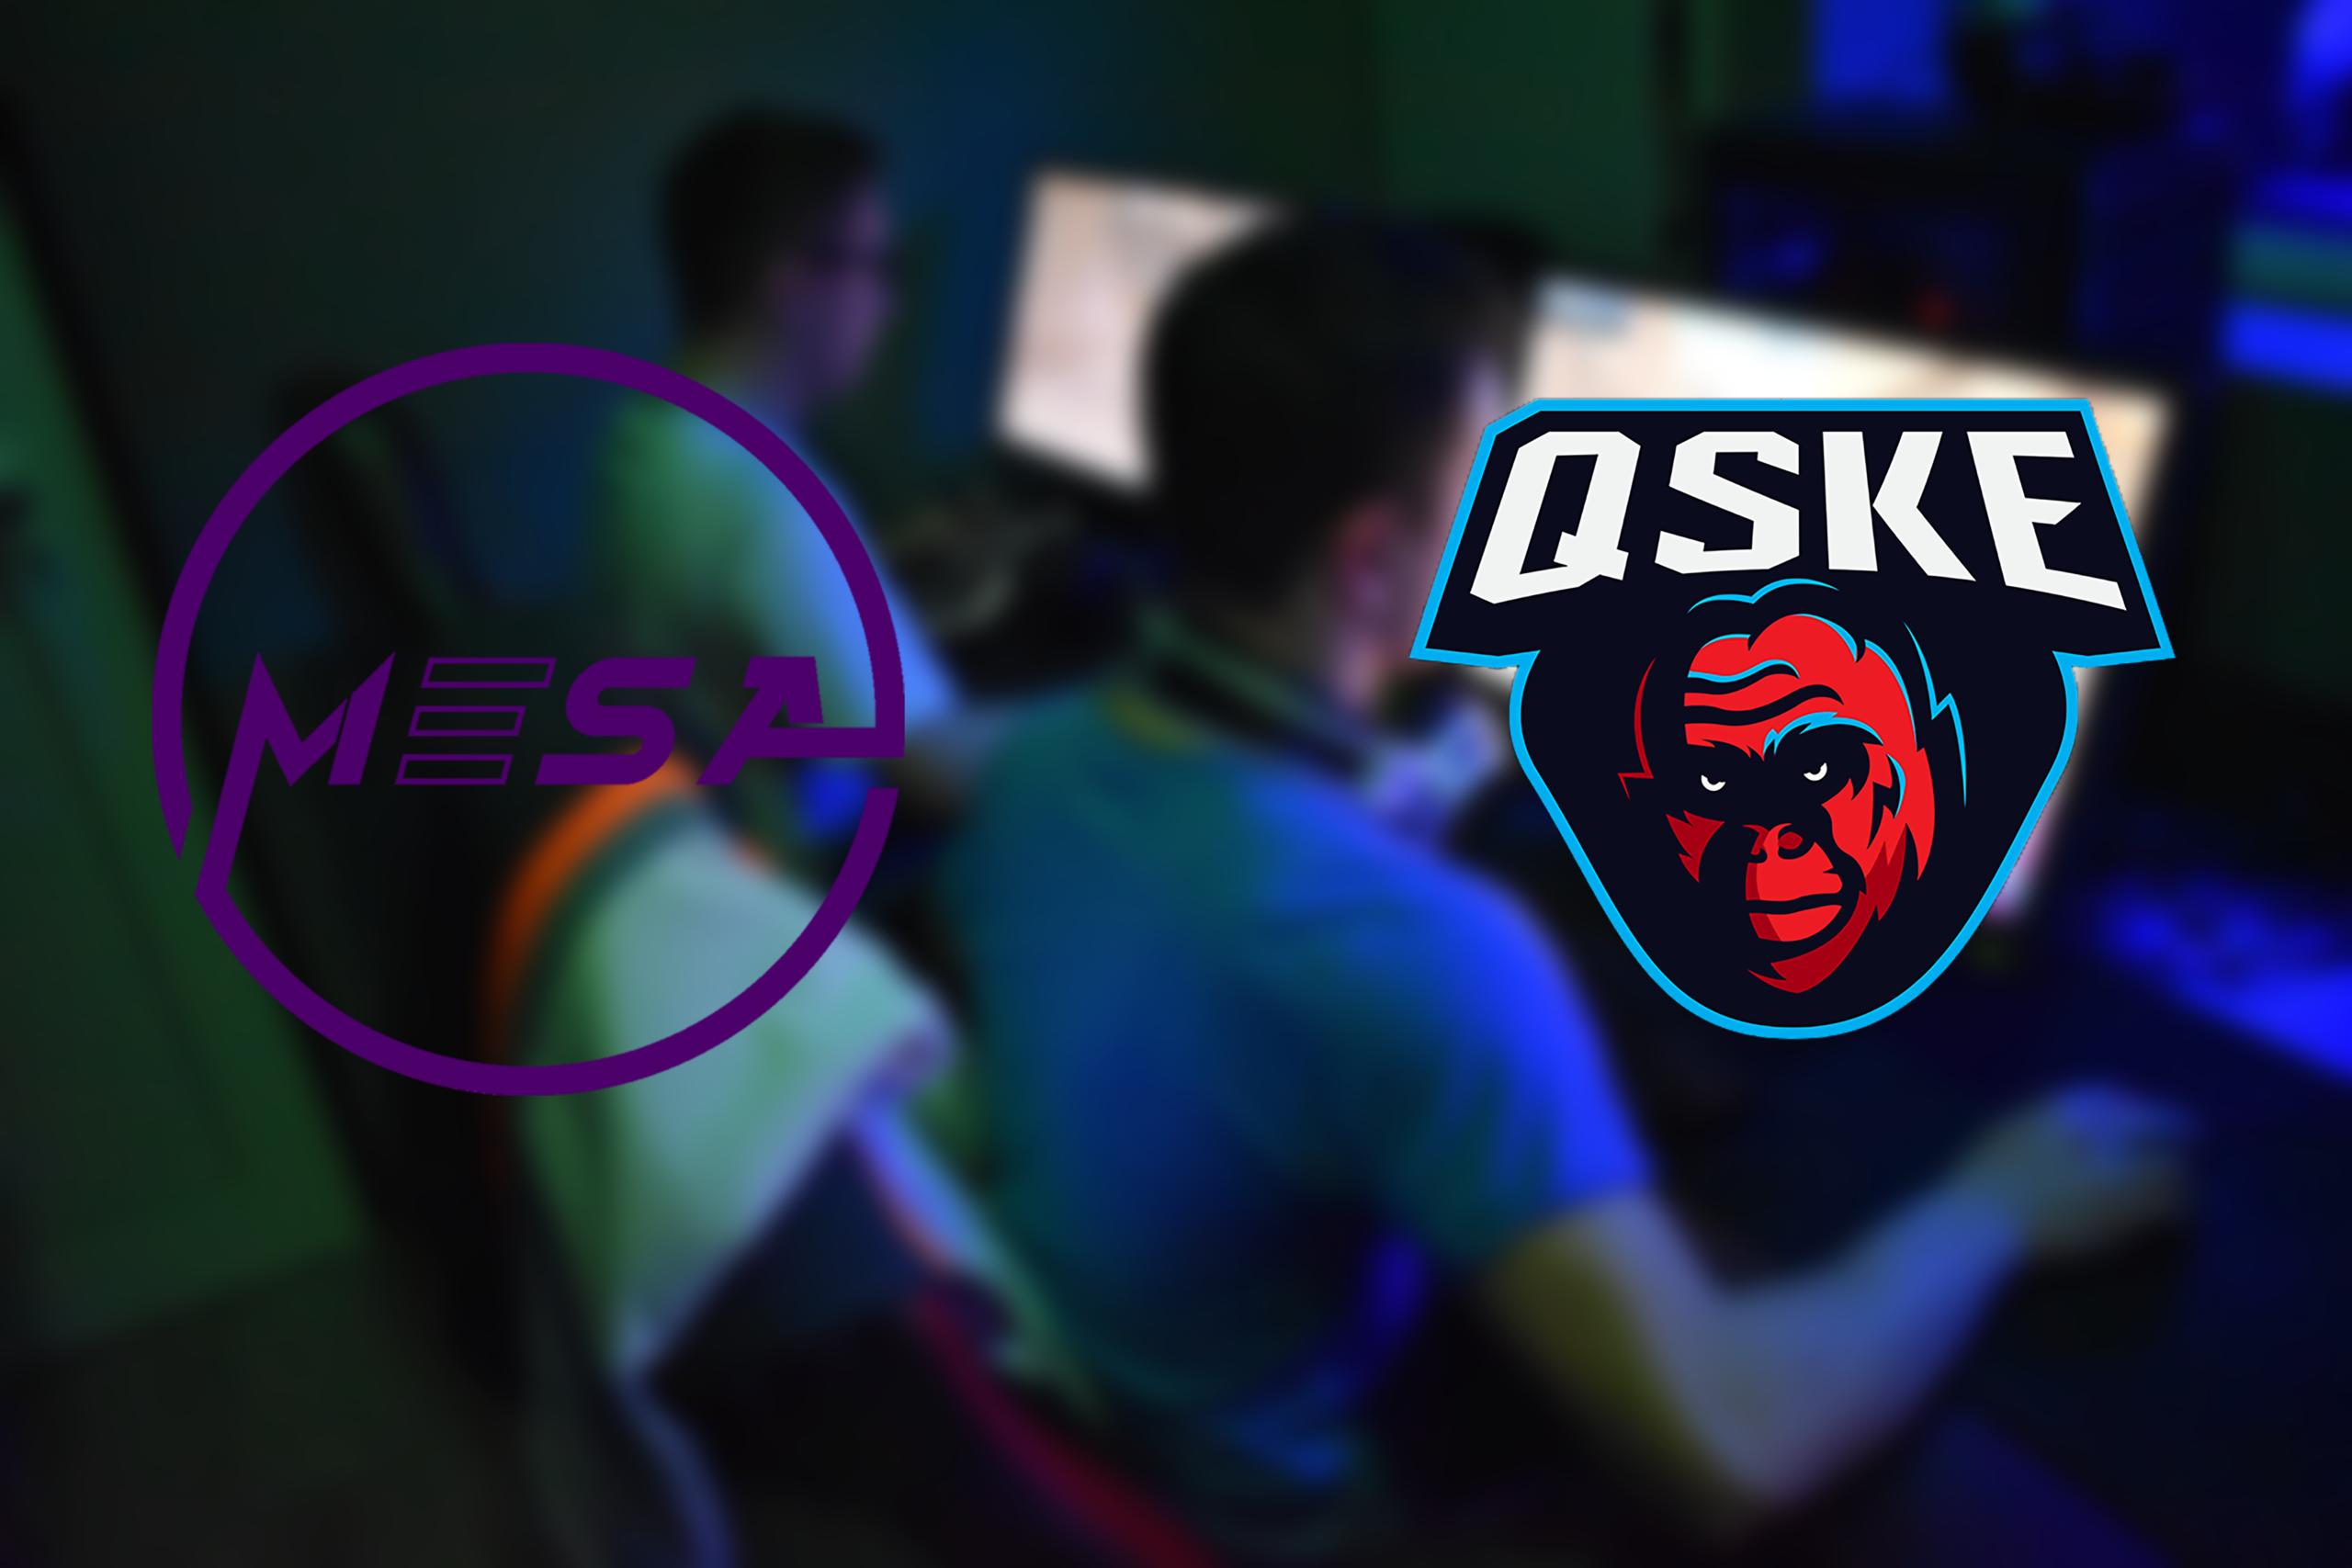 QSKE Gaming MESA_MK